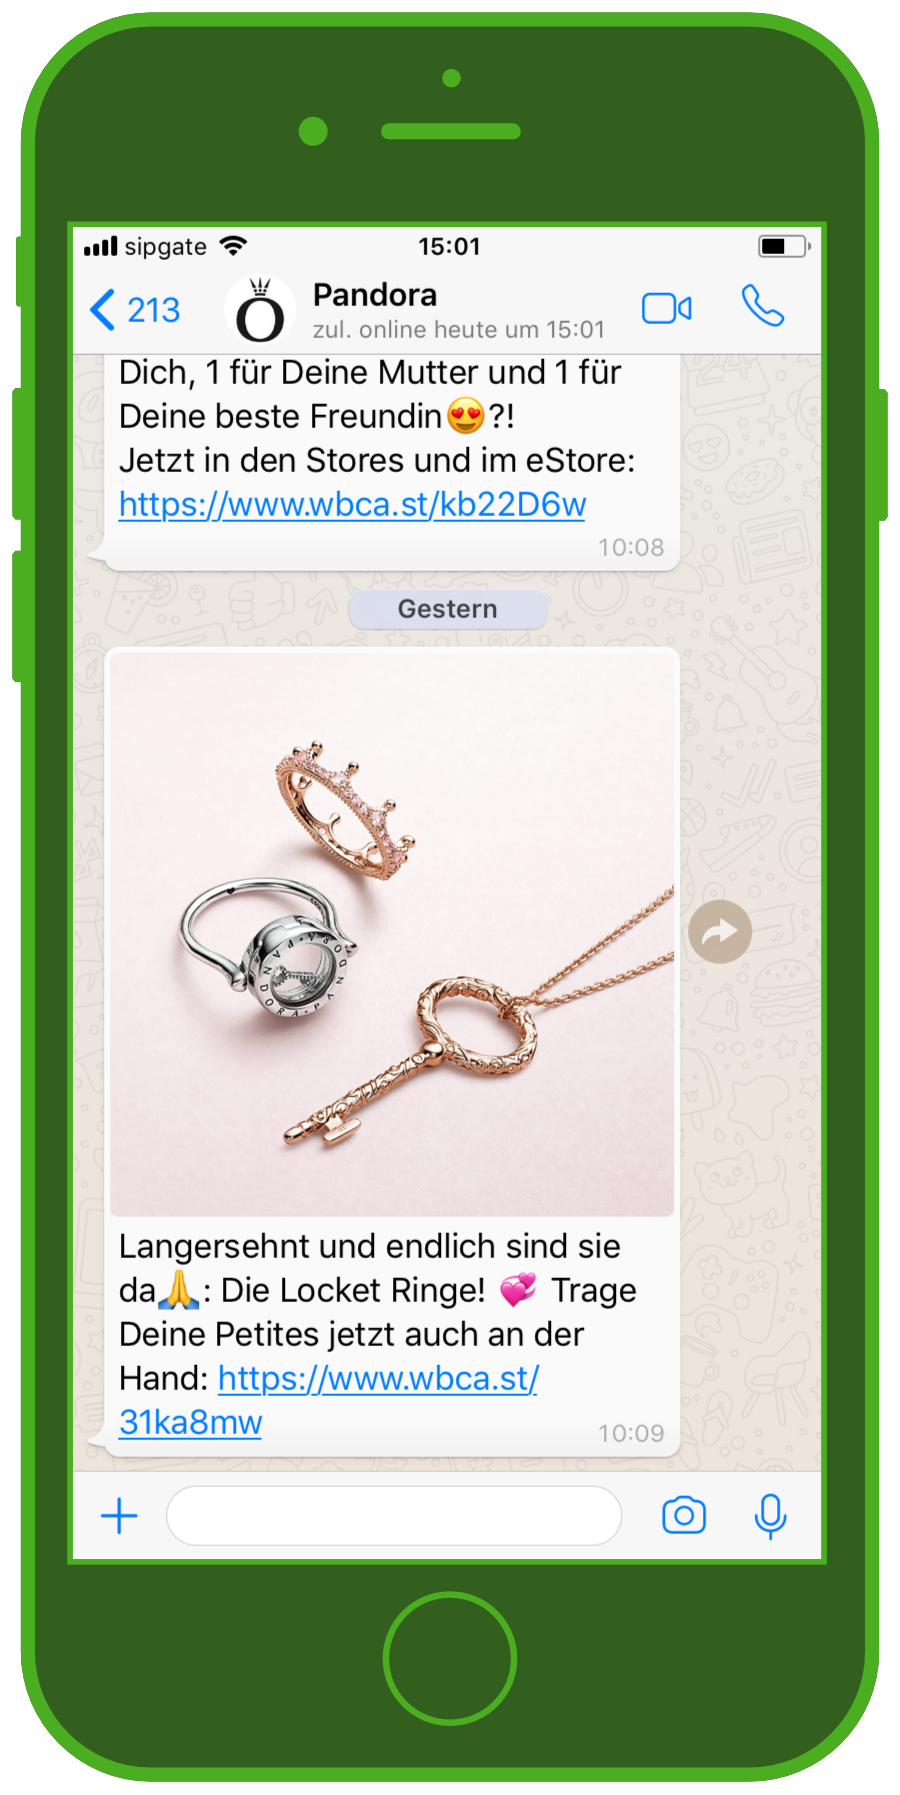 Beste whatsapp  💄 Whatsapp Status { Unique 2017 }  2019-05-09